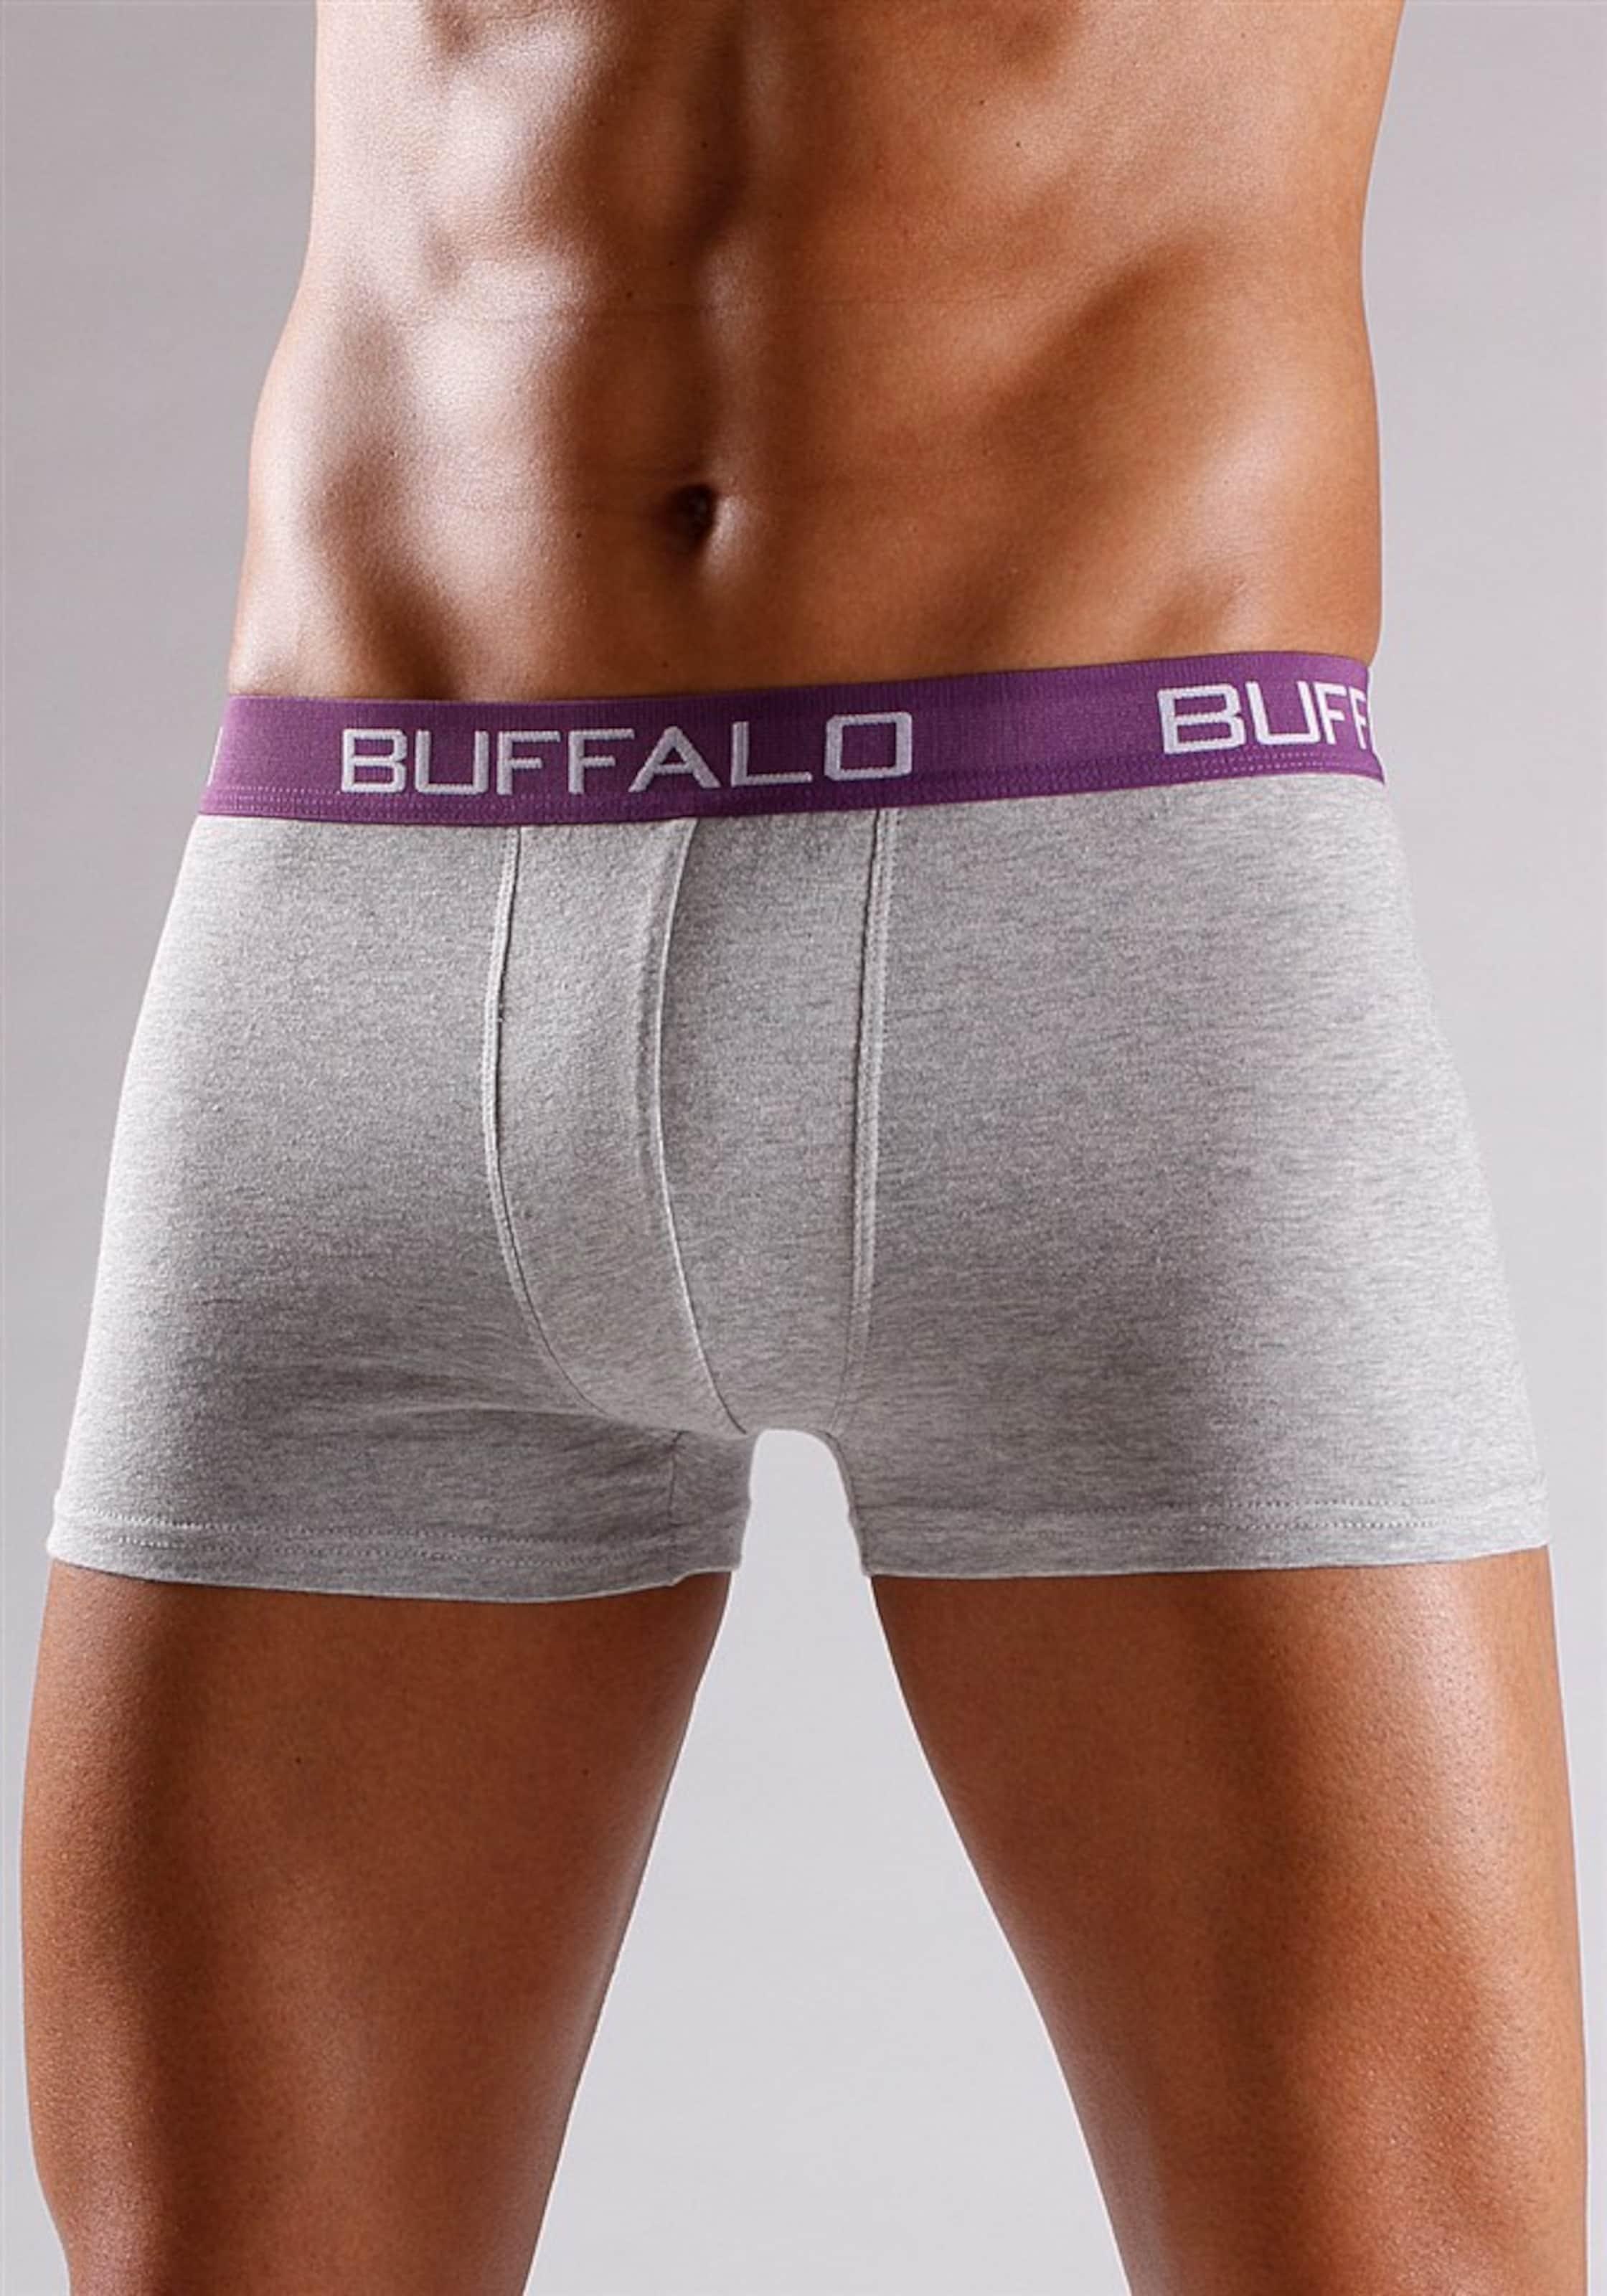 BUFFALO Baumwoll-Boxer (4 Stck.) Billig Verkauf Websites 4NC89